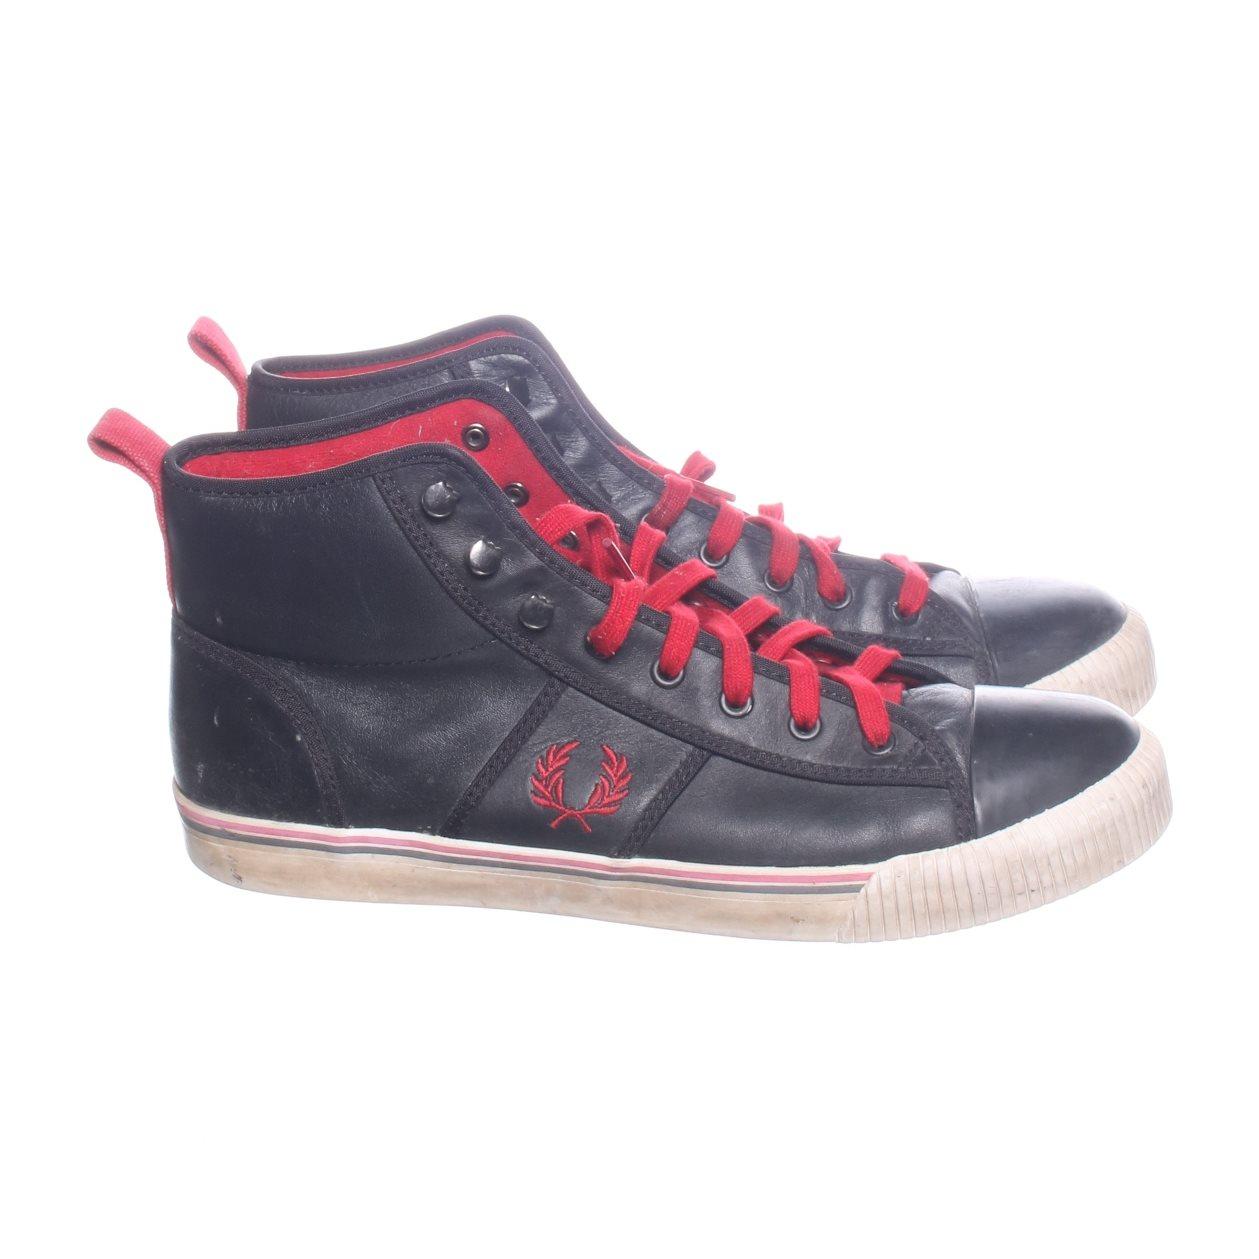 7843926b53aa Fred Perry, Sneakers, Strl: 43, Svart/Röd (340386910) ᐈ Sellpy på ...